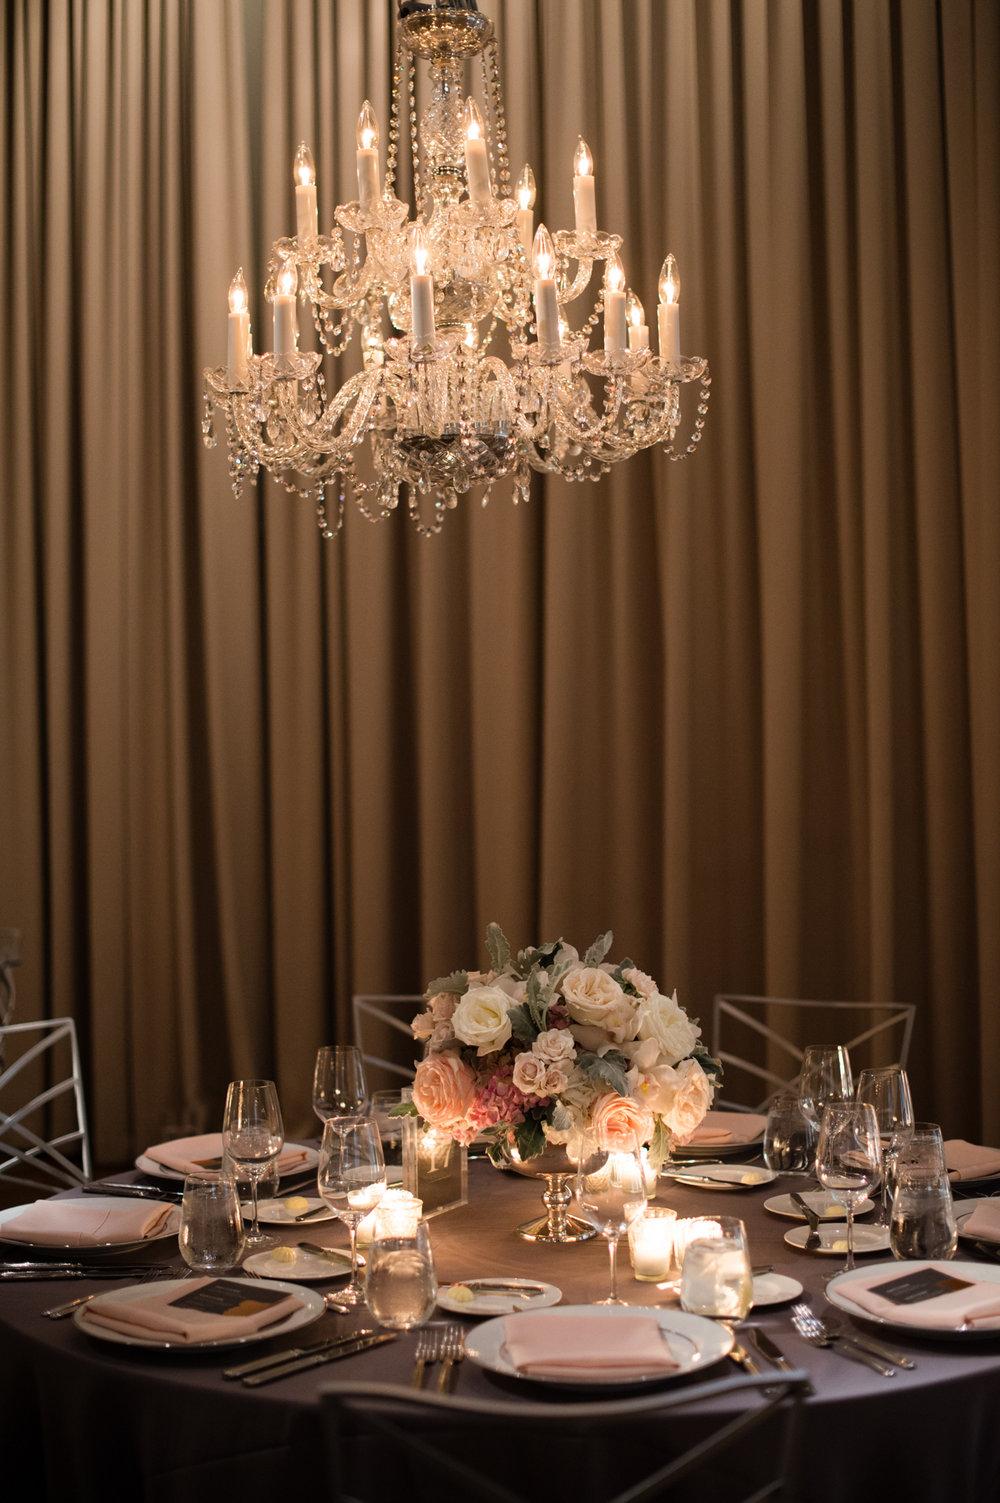 Ivy Room Chicago classic wedding reception decor by HMR Designs